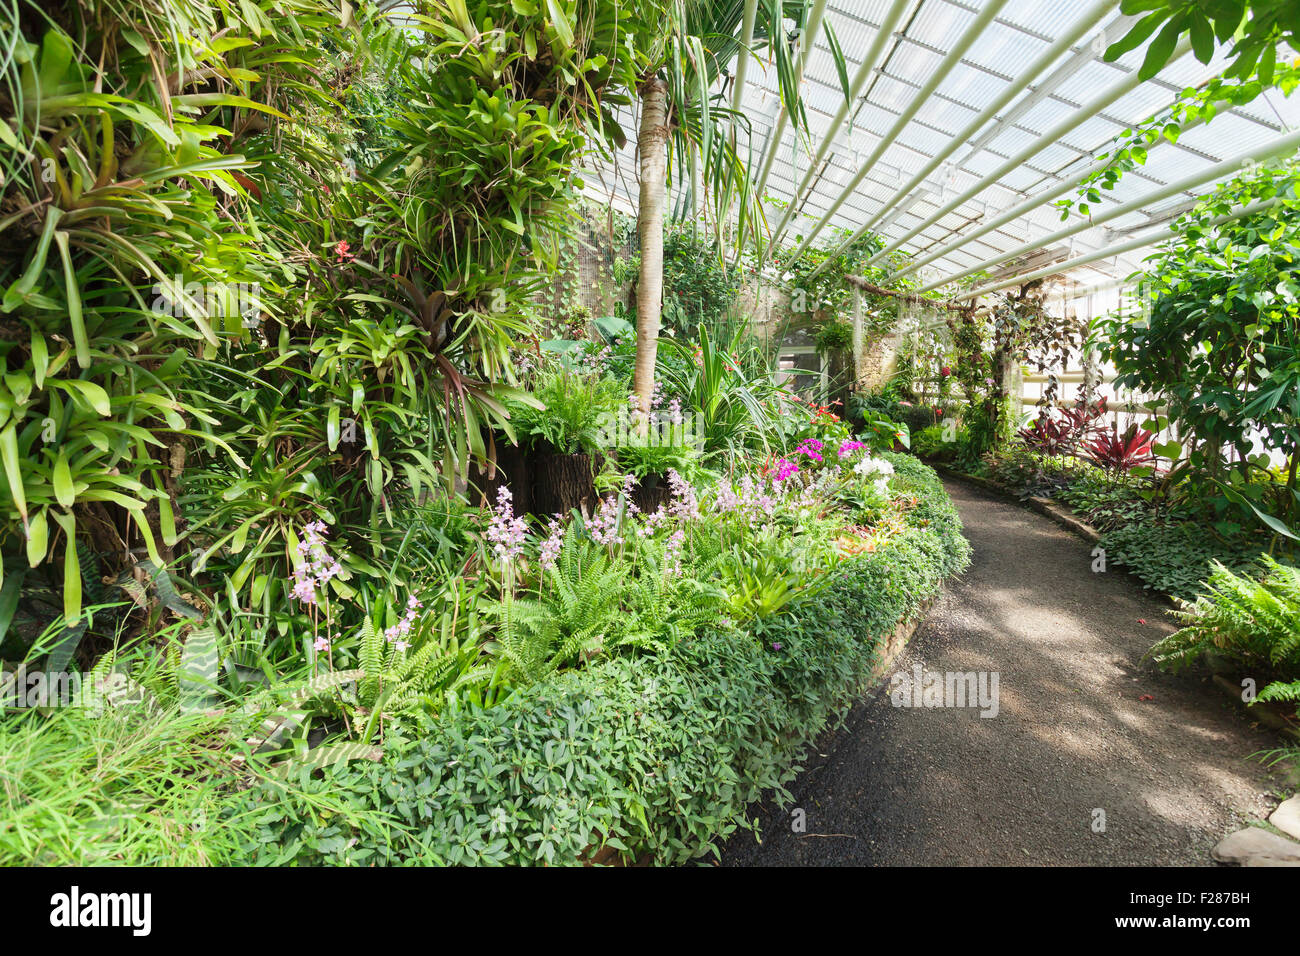 Greenhouse Botanical Garden Karlsruhe Baden Württemberg Germany